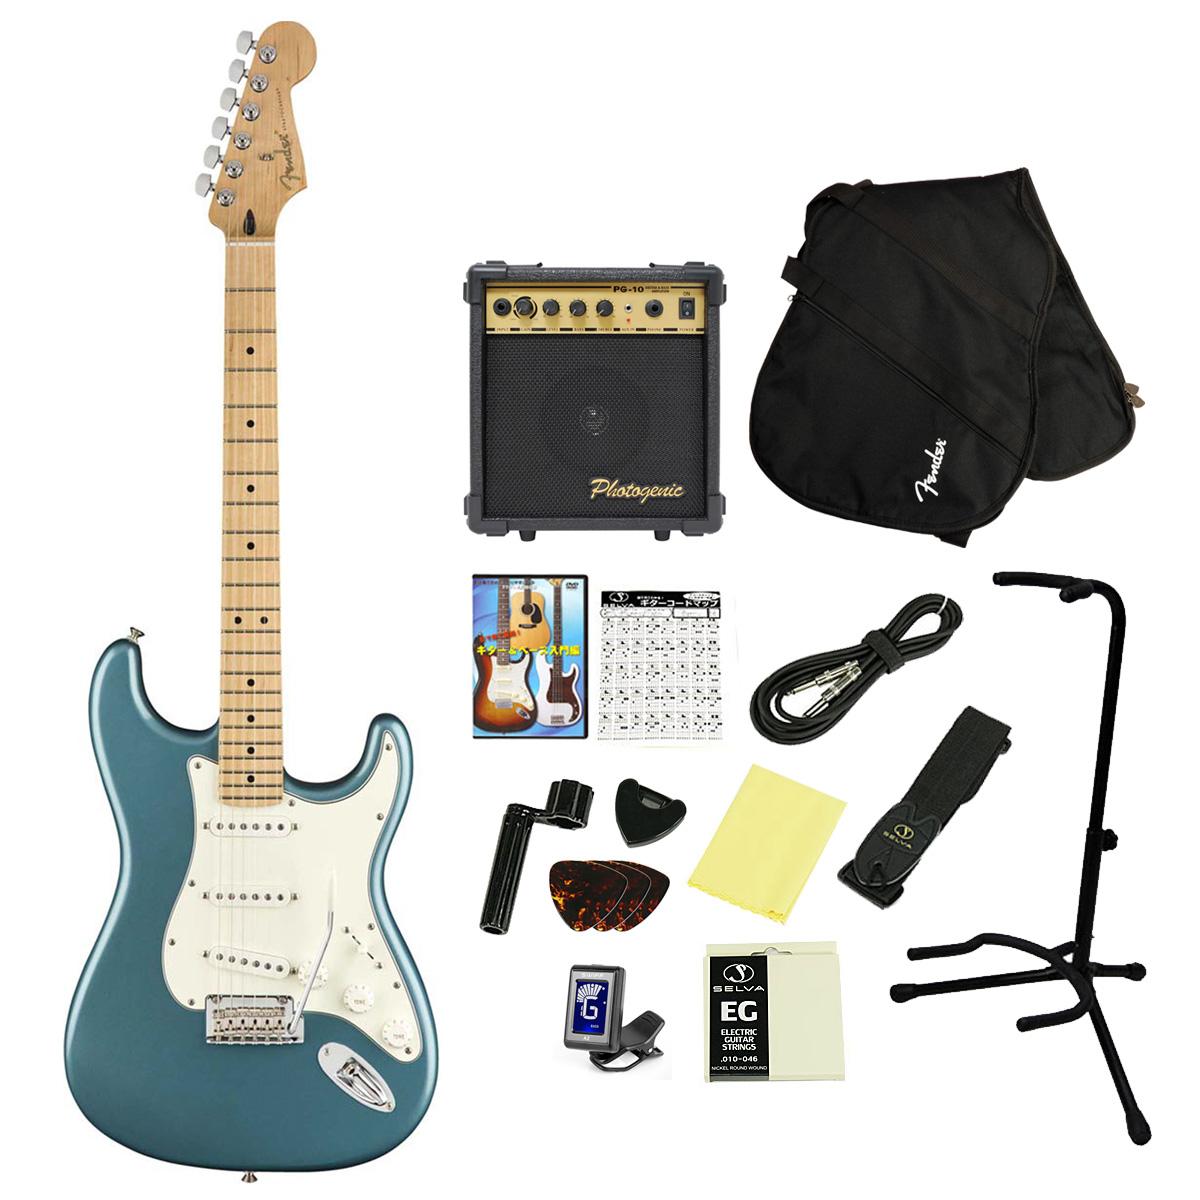 Fender / Player Series Stratocaster Tidepool Maple FB 16点アクセサリーセット